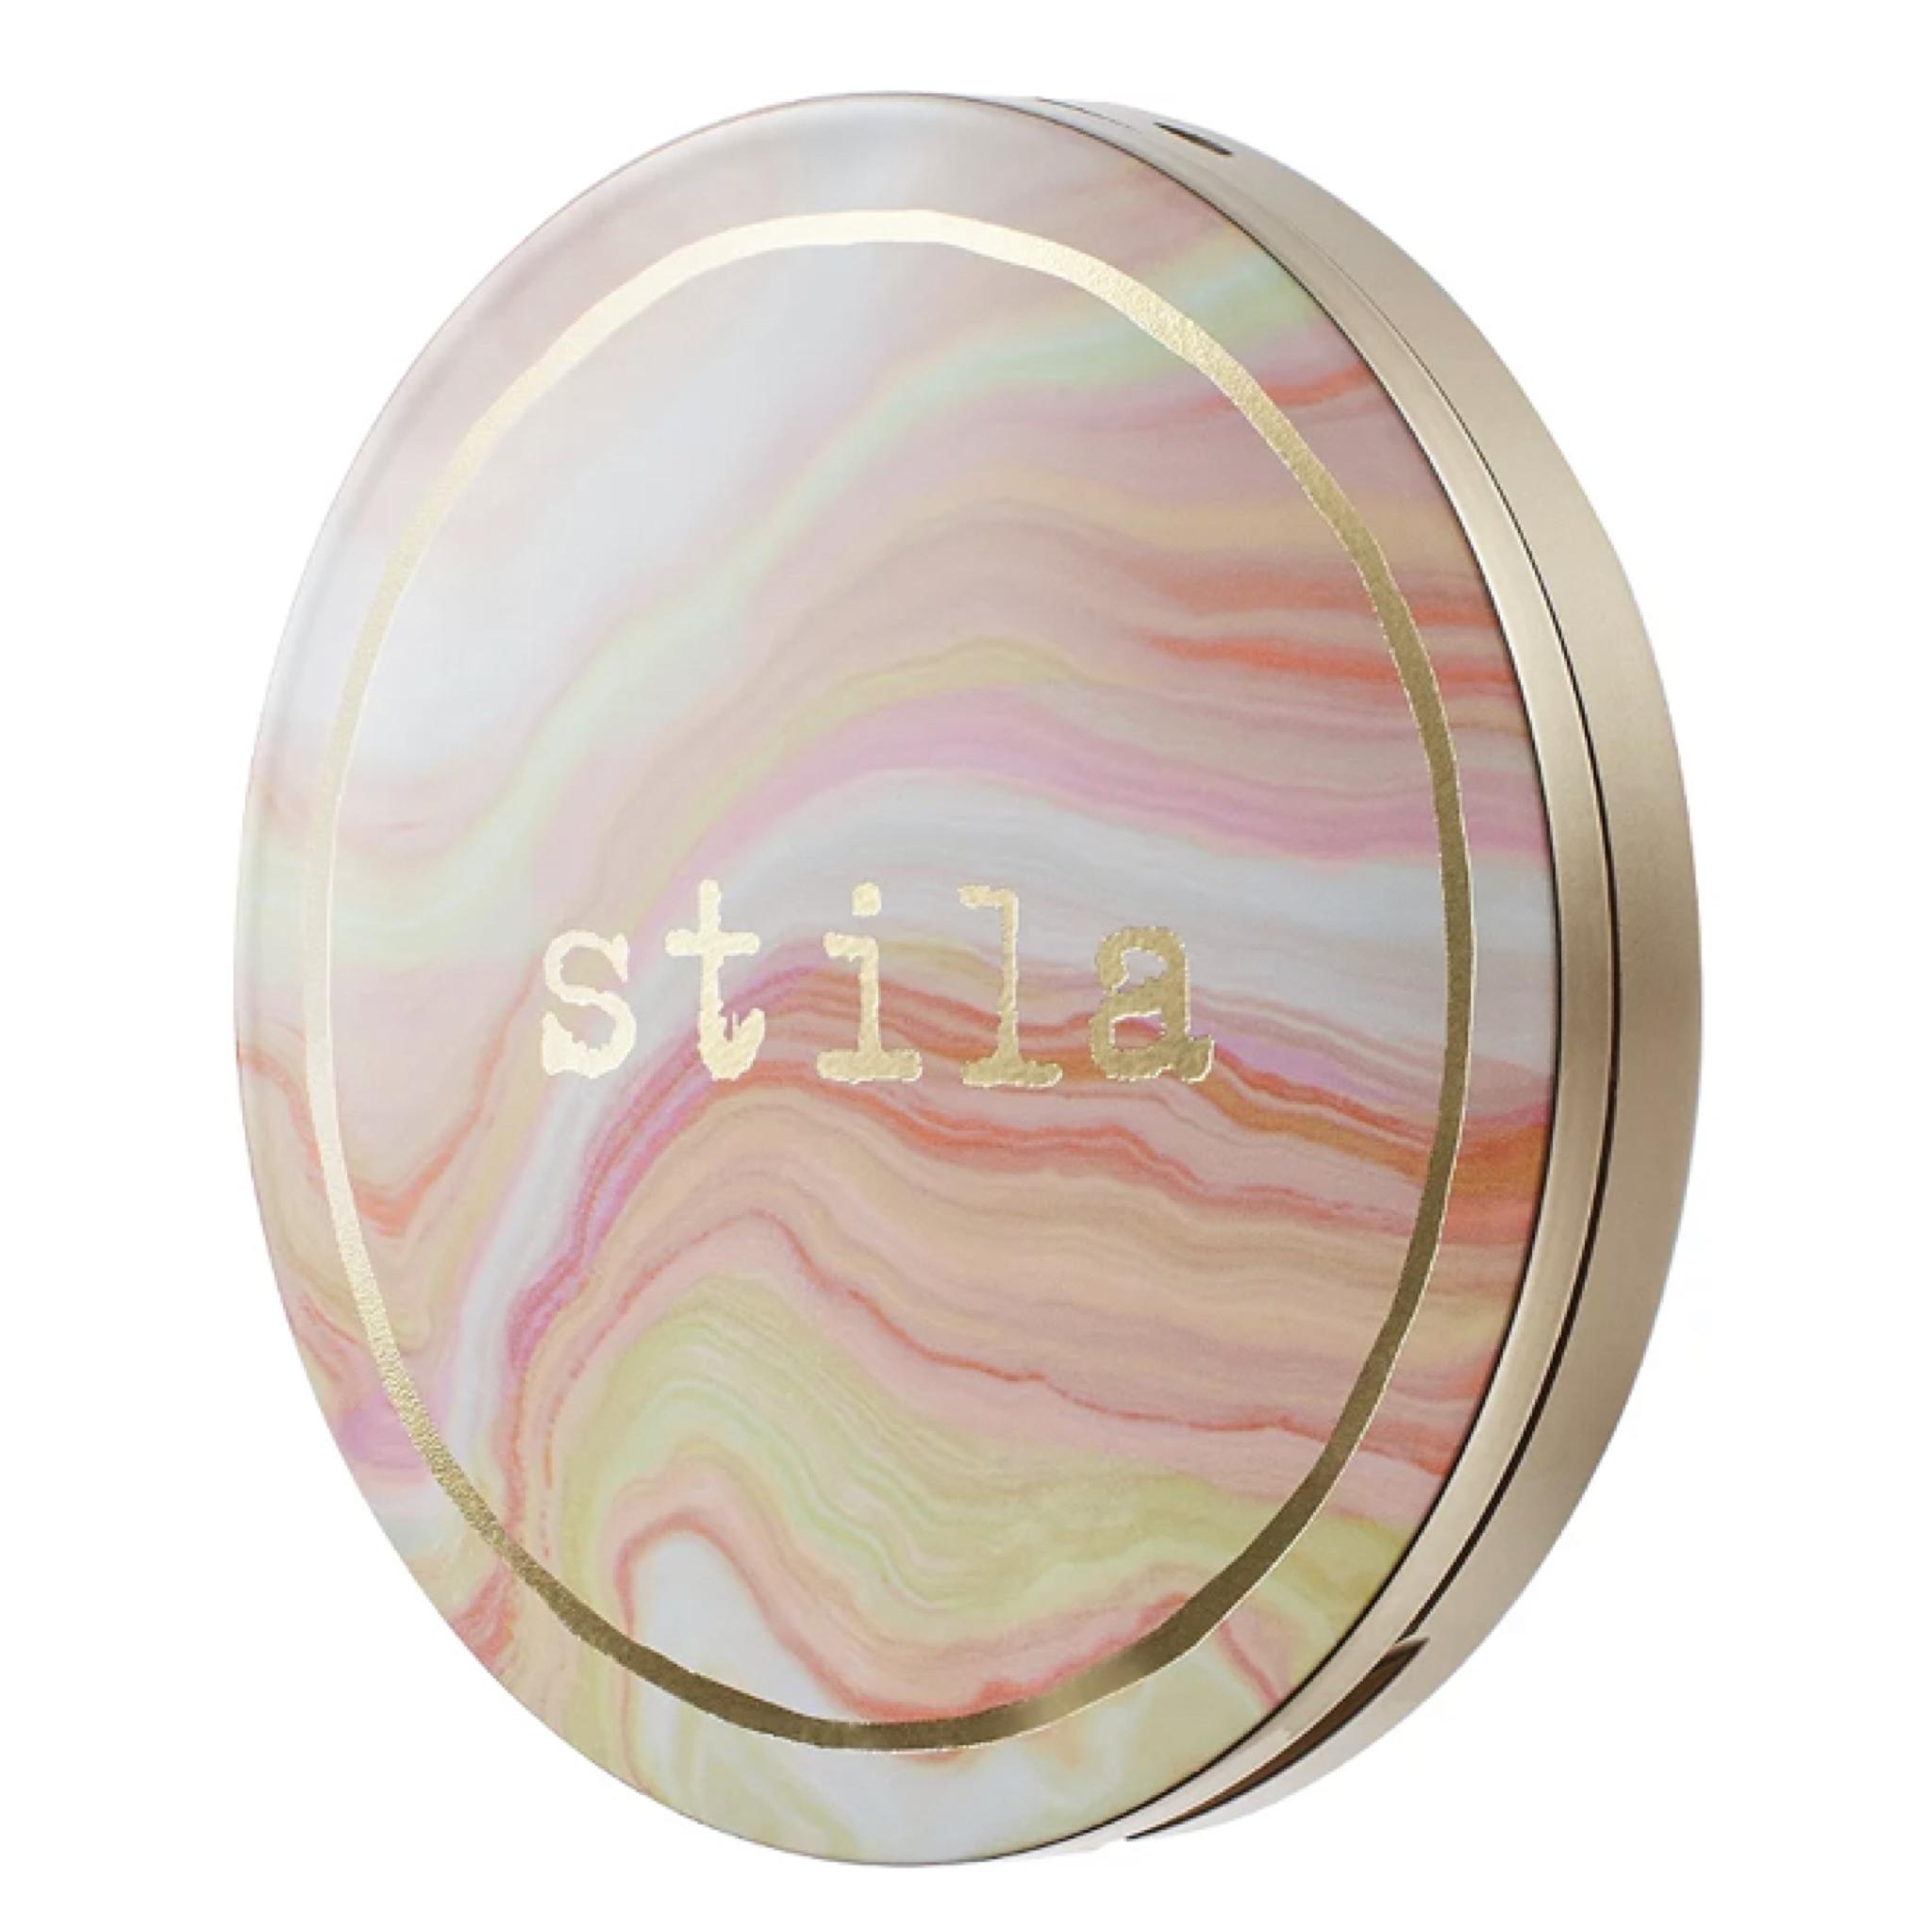 Stila One Step Correct Brightening Finishing Powder